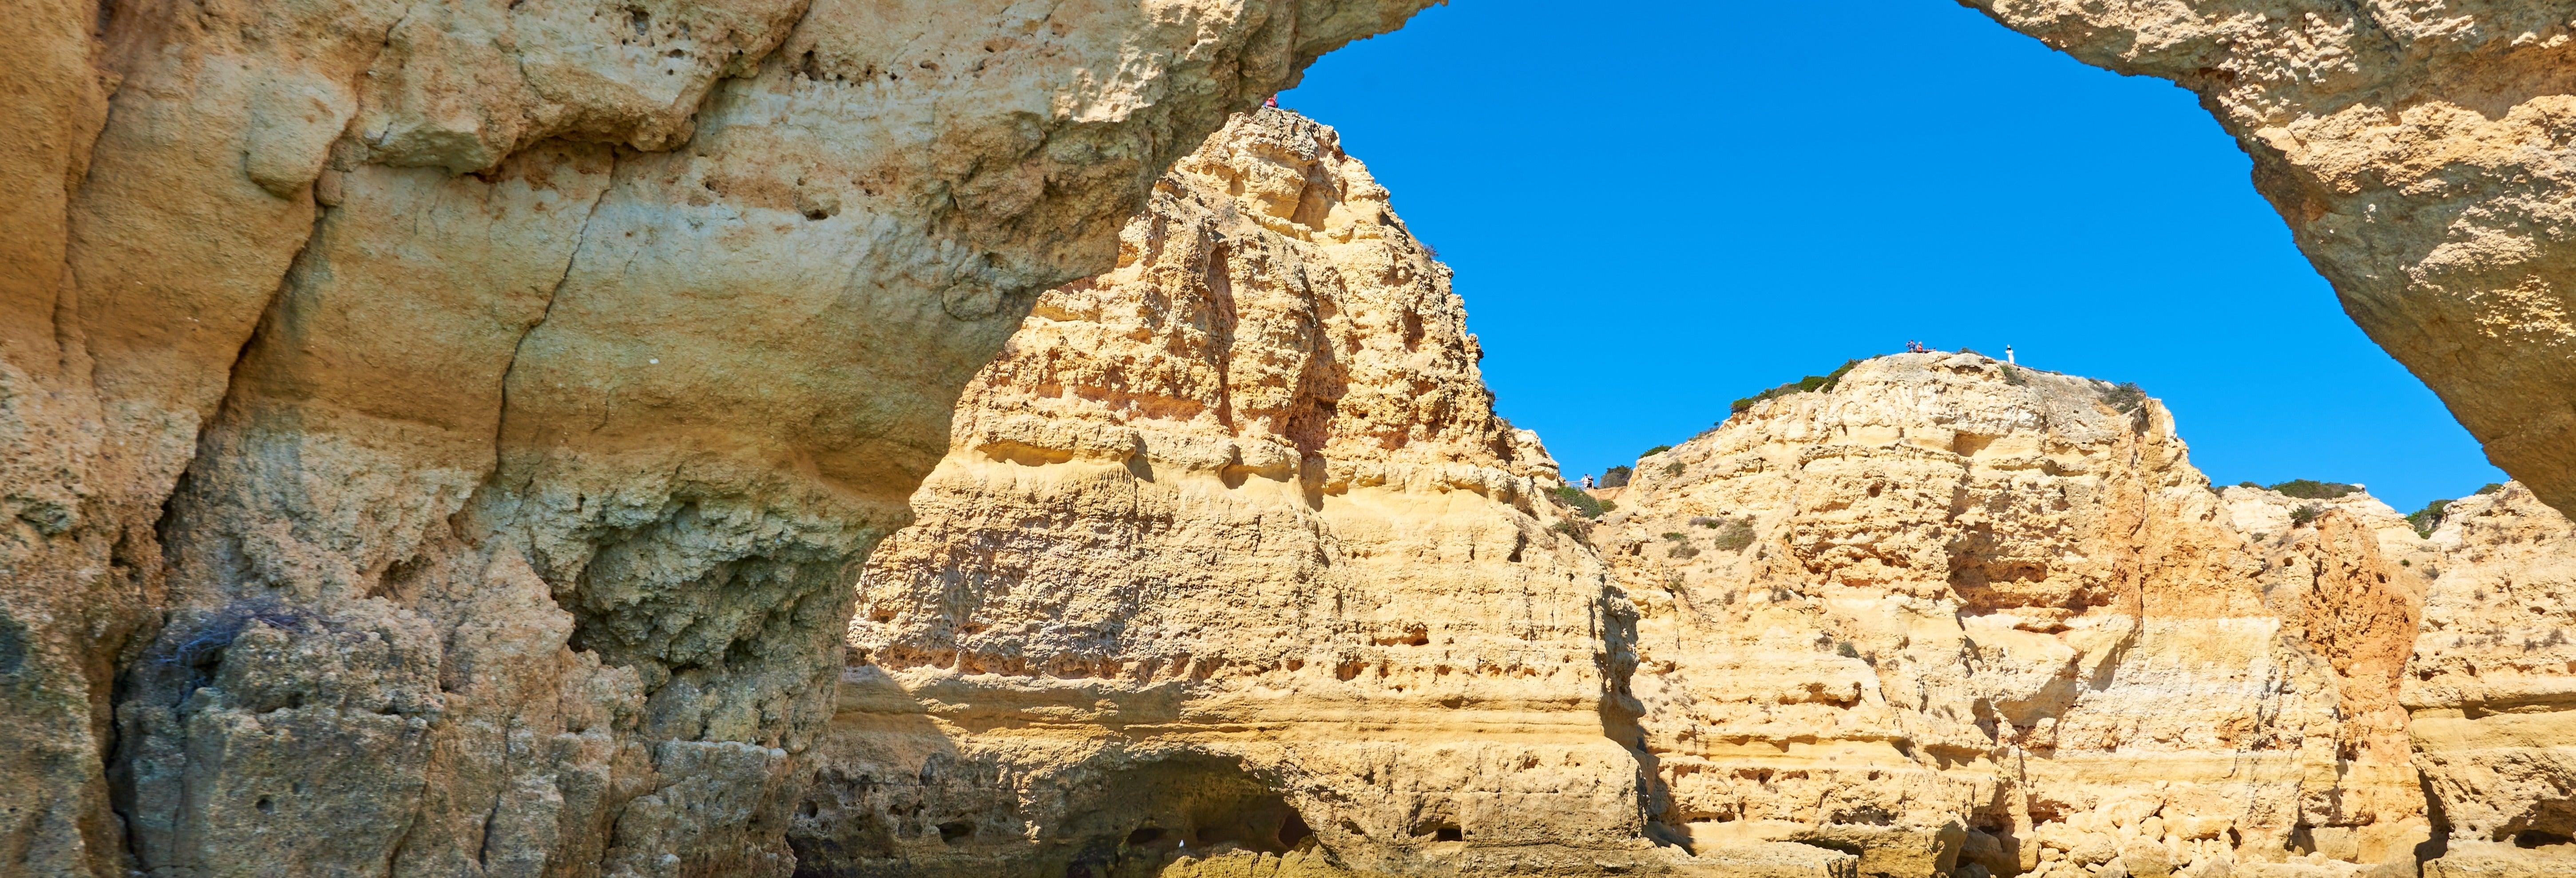 Benagil Caves Cruise & Snorkel